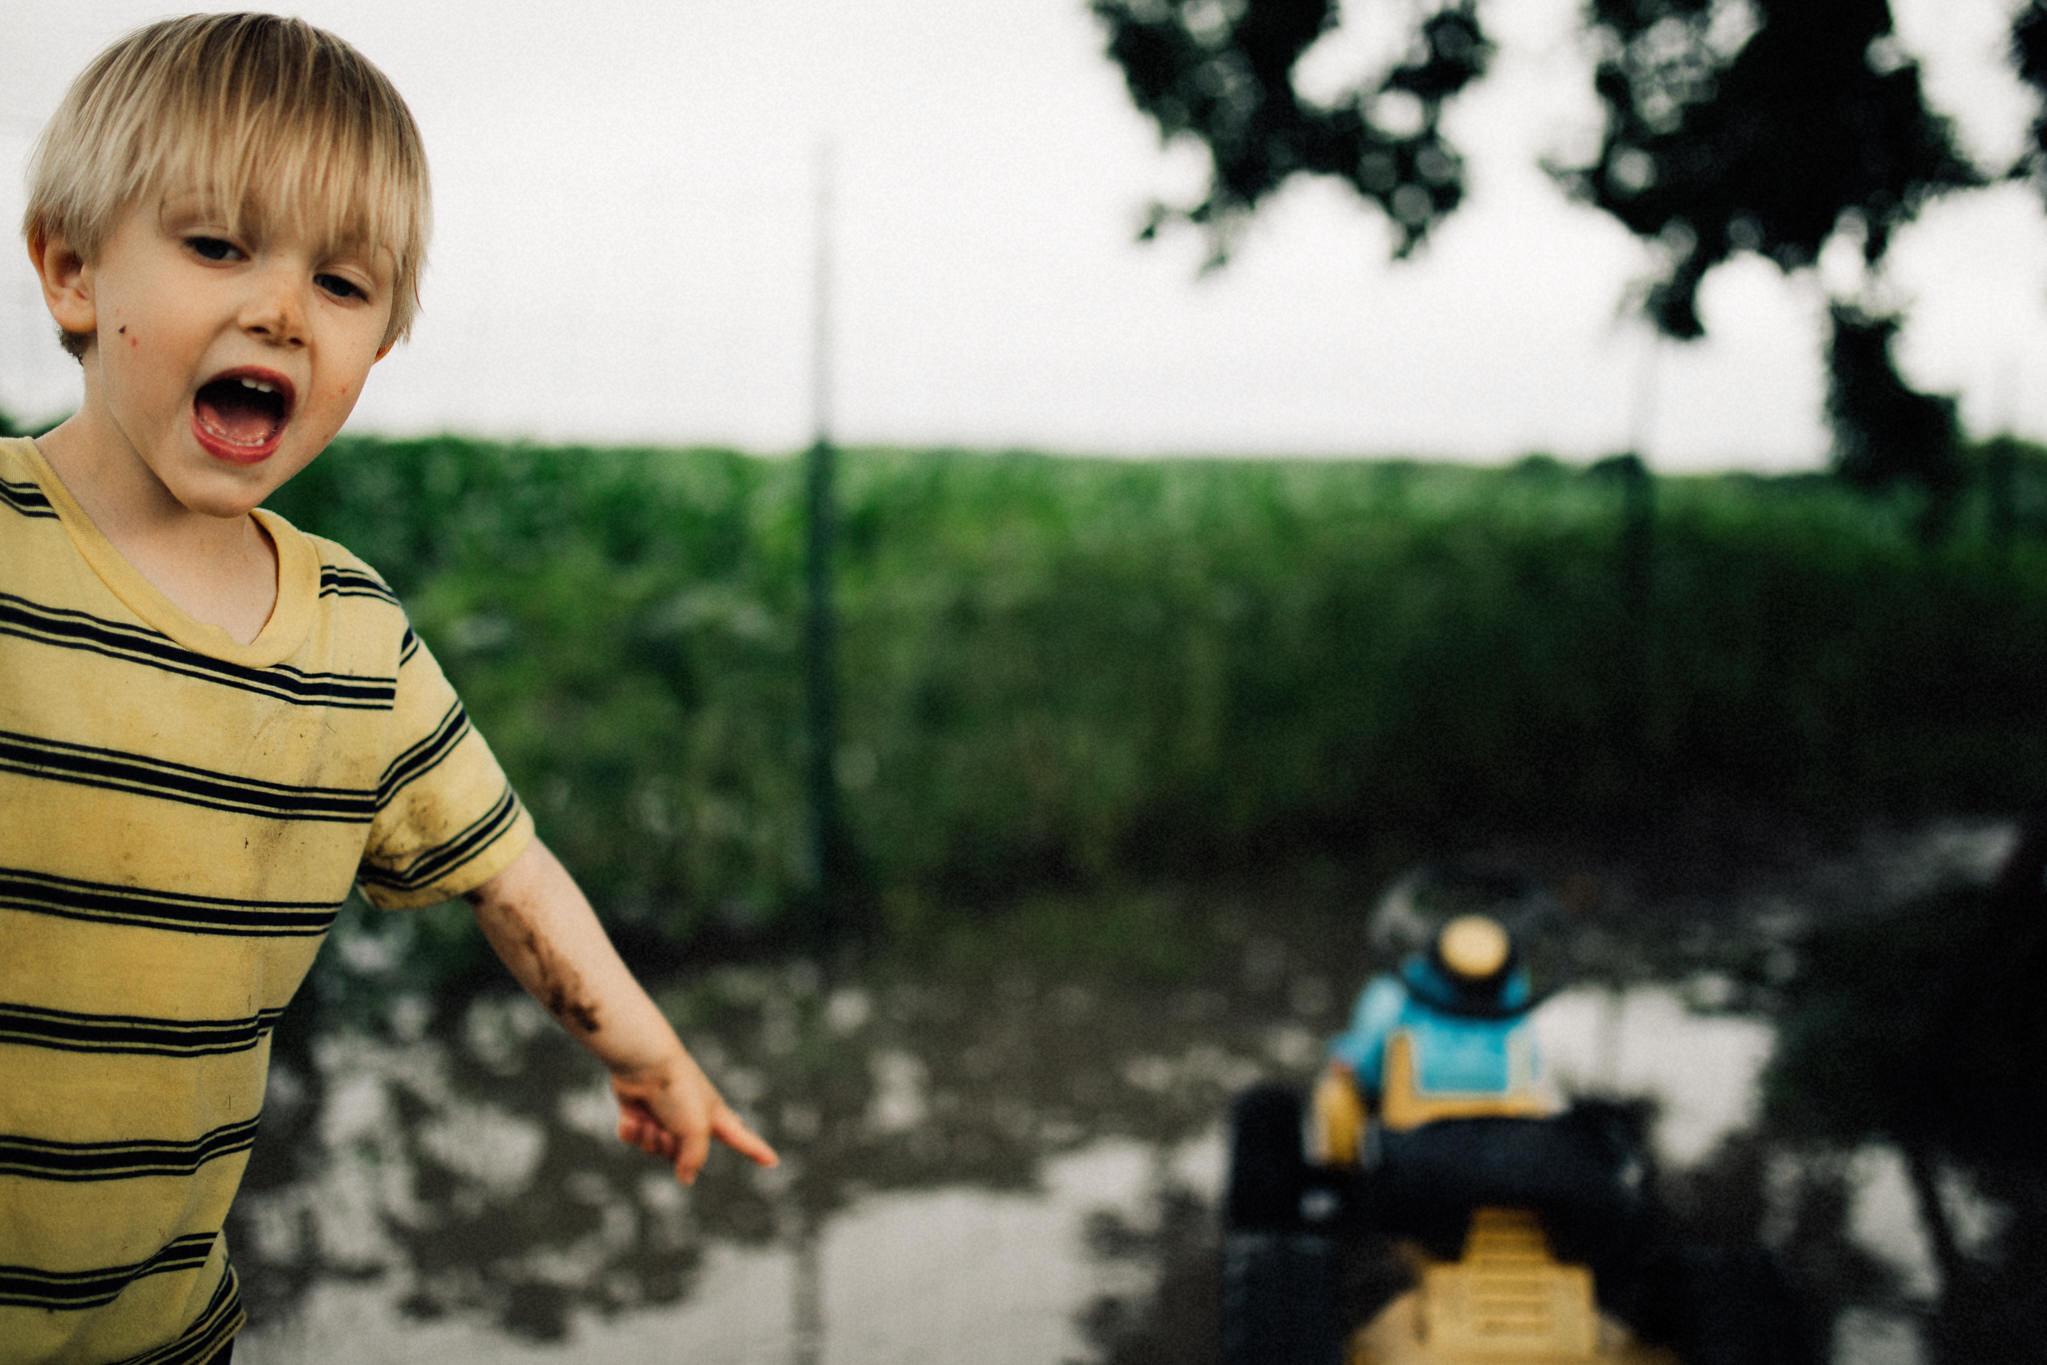 muddy-spring-day-rural-life-photography01.jpg